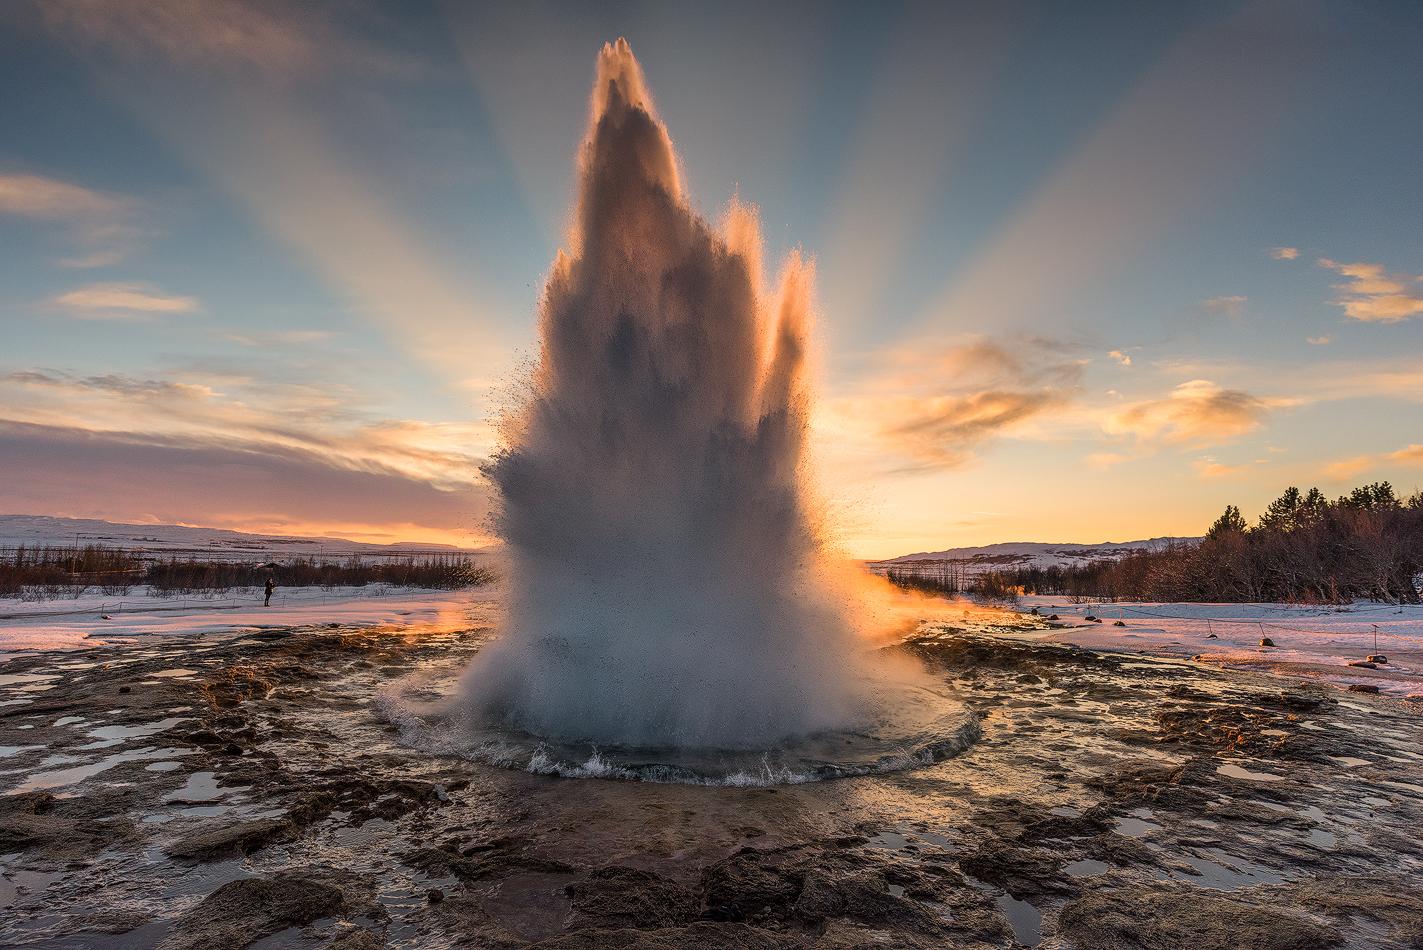 Capturer le moment où le geyser Strokkur entre en éruption à Geysir